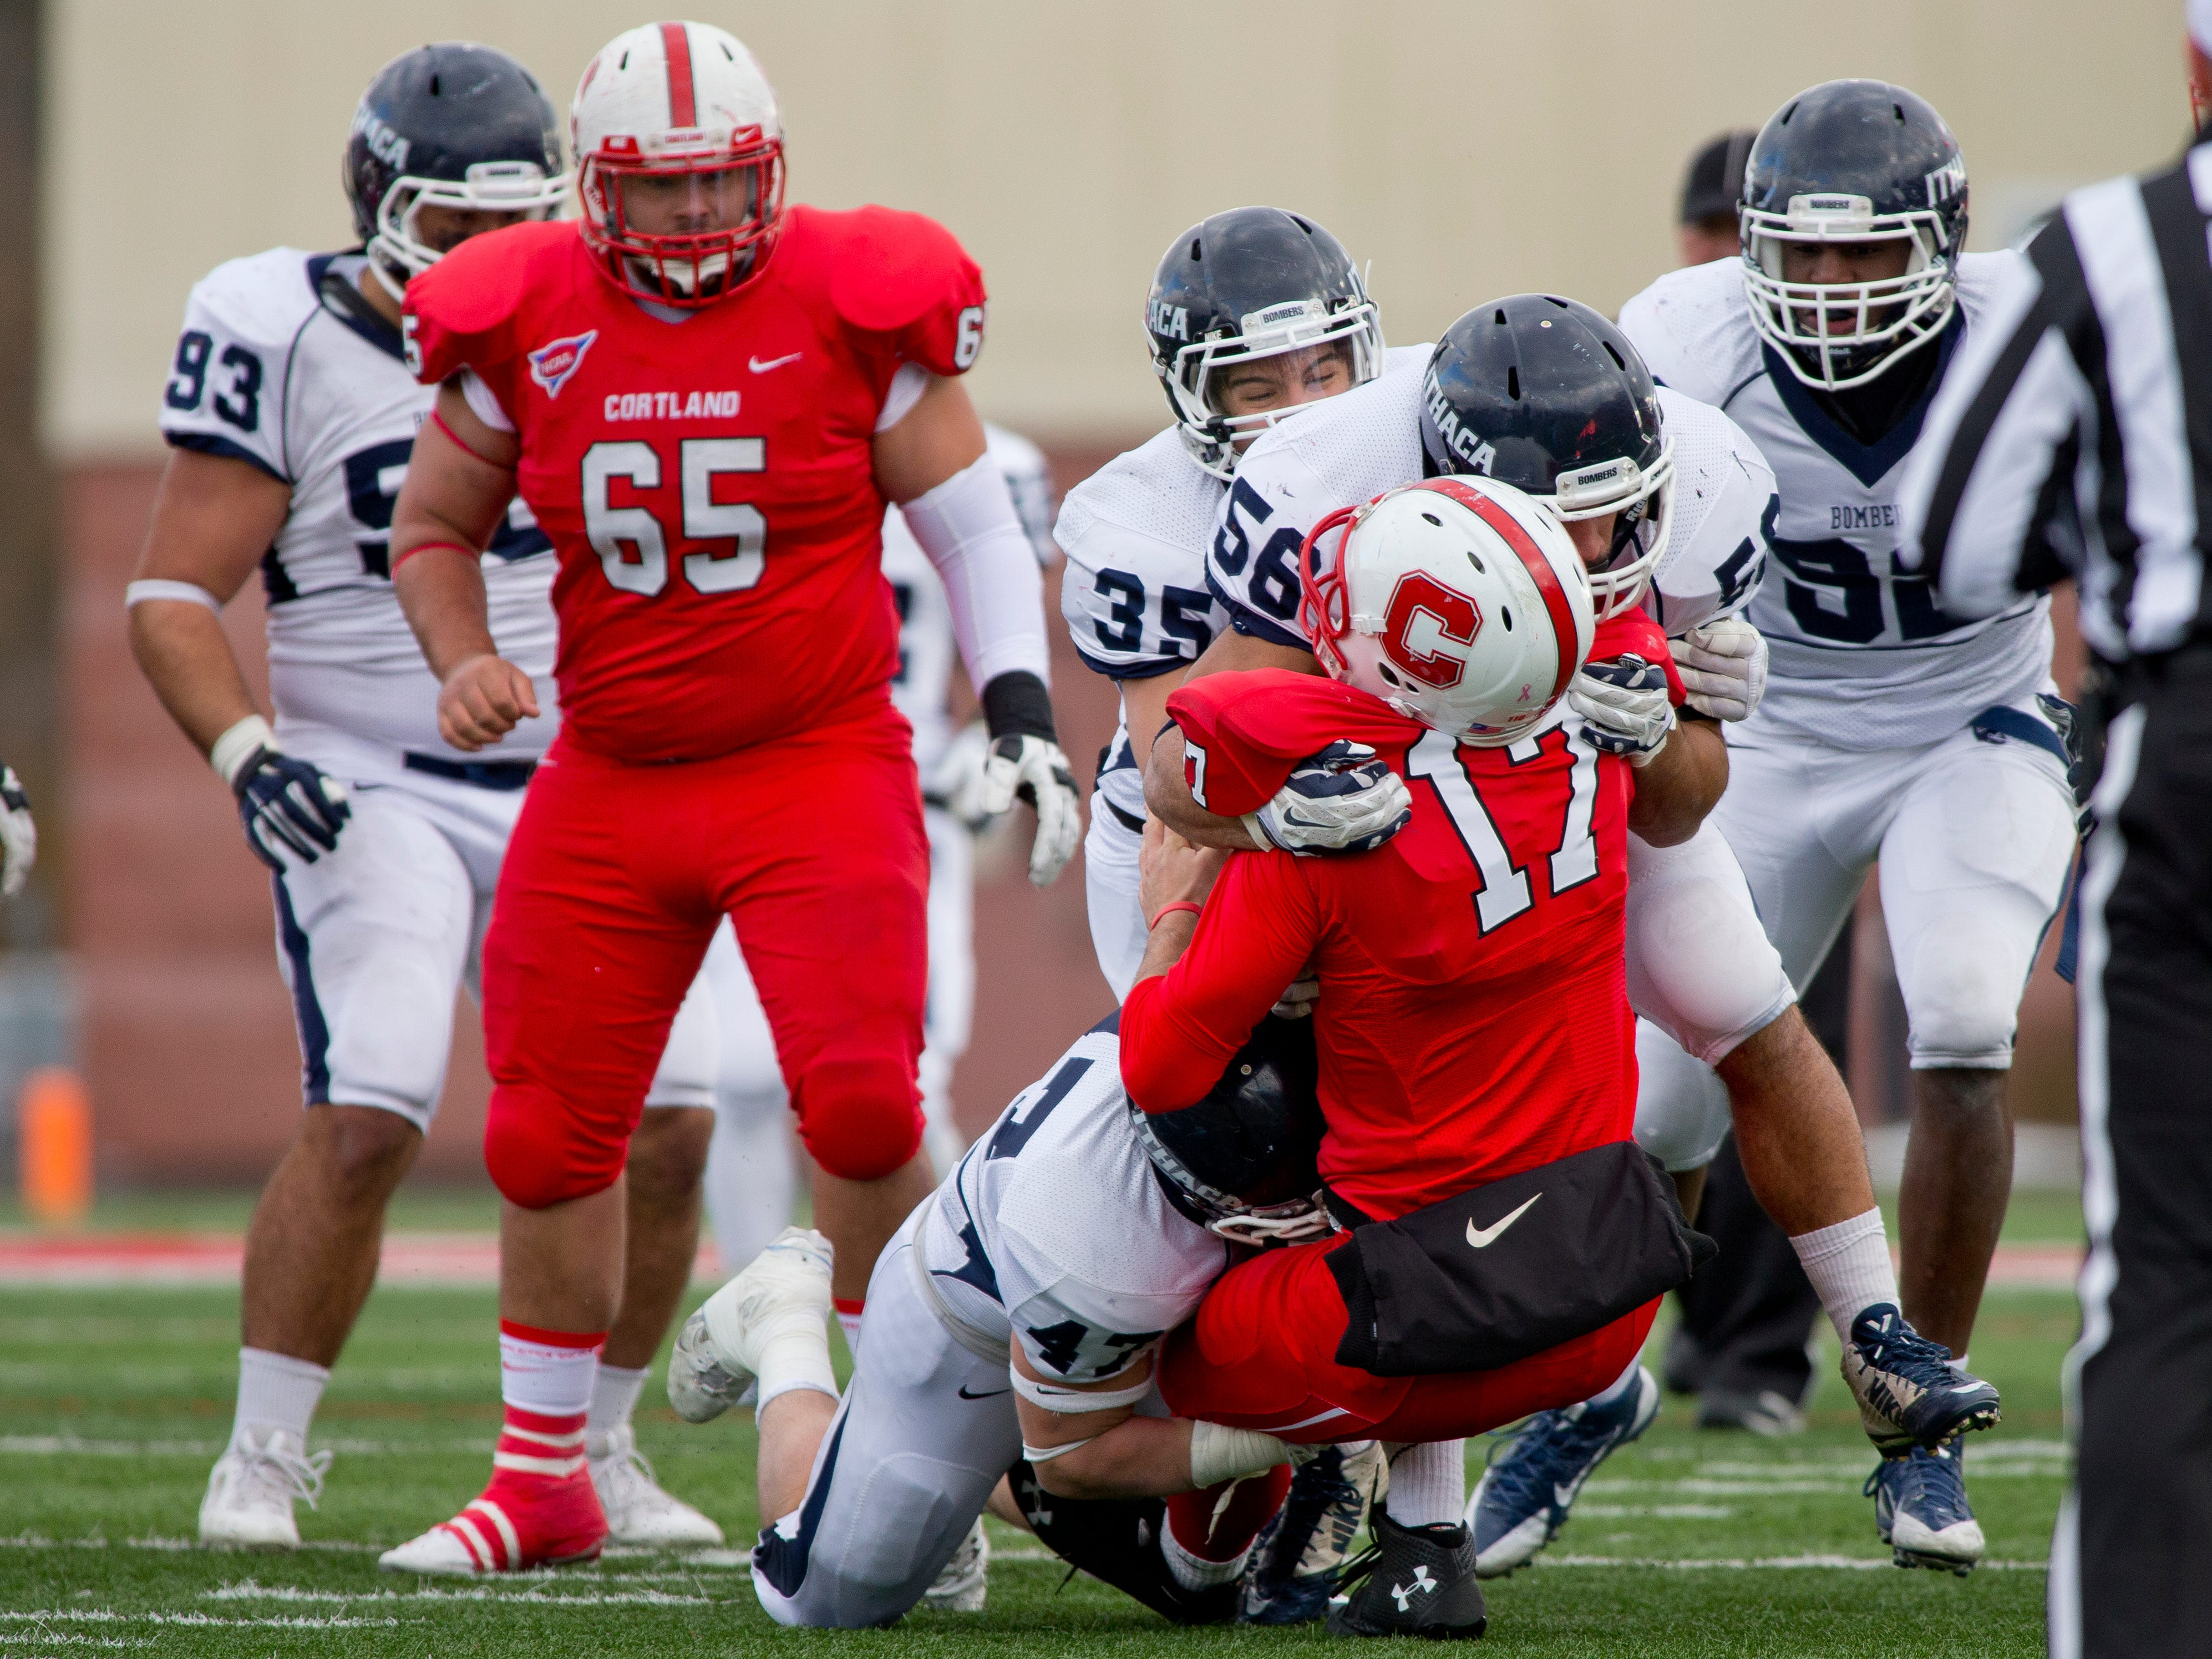 2014: The Ithaca defense takles Cortland's Lou Buschi Saturday during the Cortaca Jug game in Cortland.